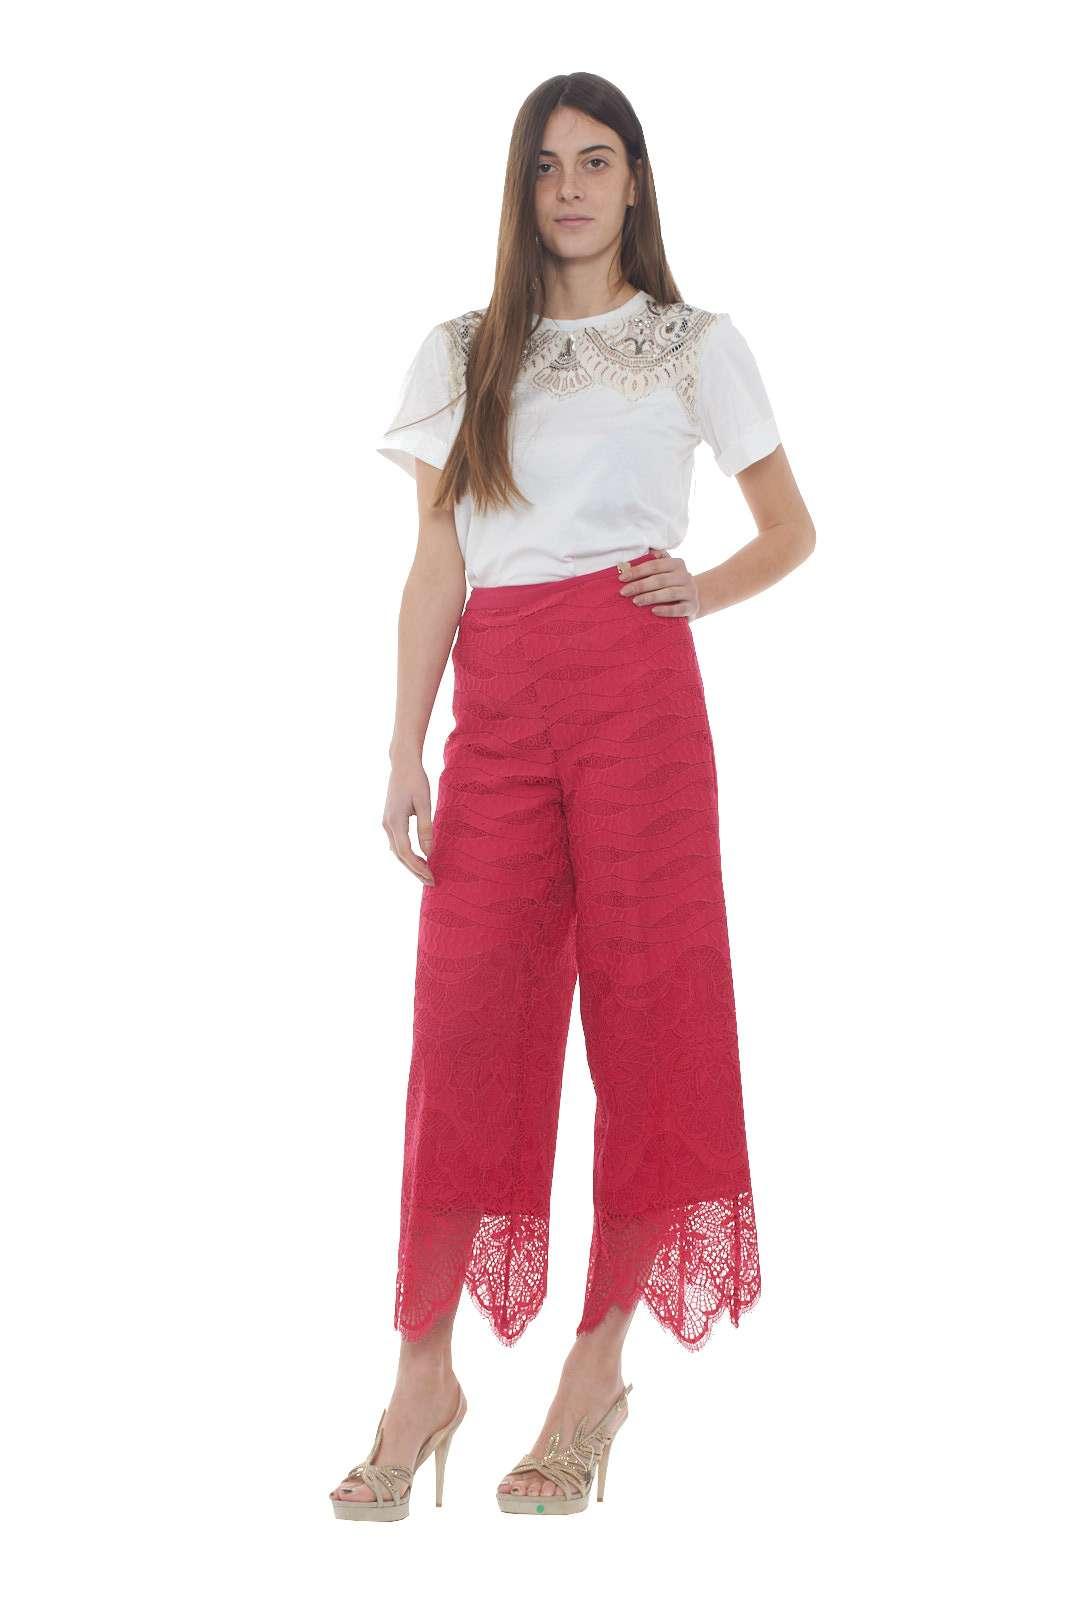 https://www.parmax.com/media/catalog/product/a/i/PE-outlet_parmax-pantaloni-donna-TwinSet-201TP2033-D.jpg